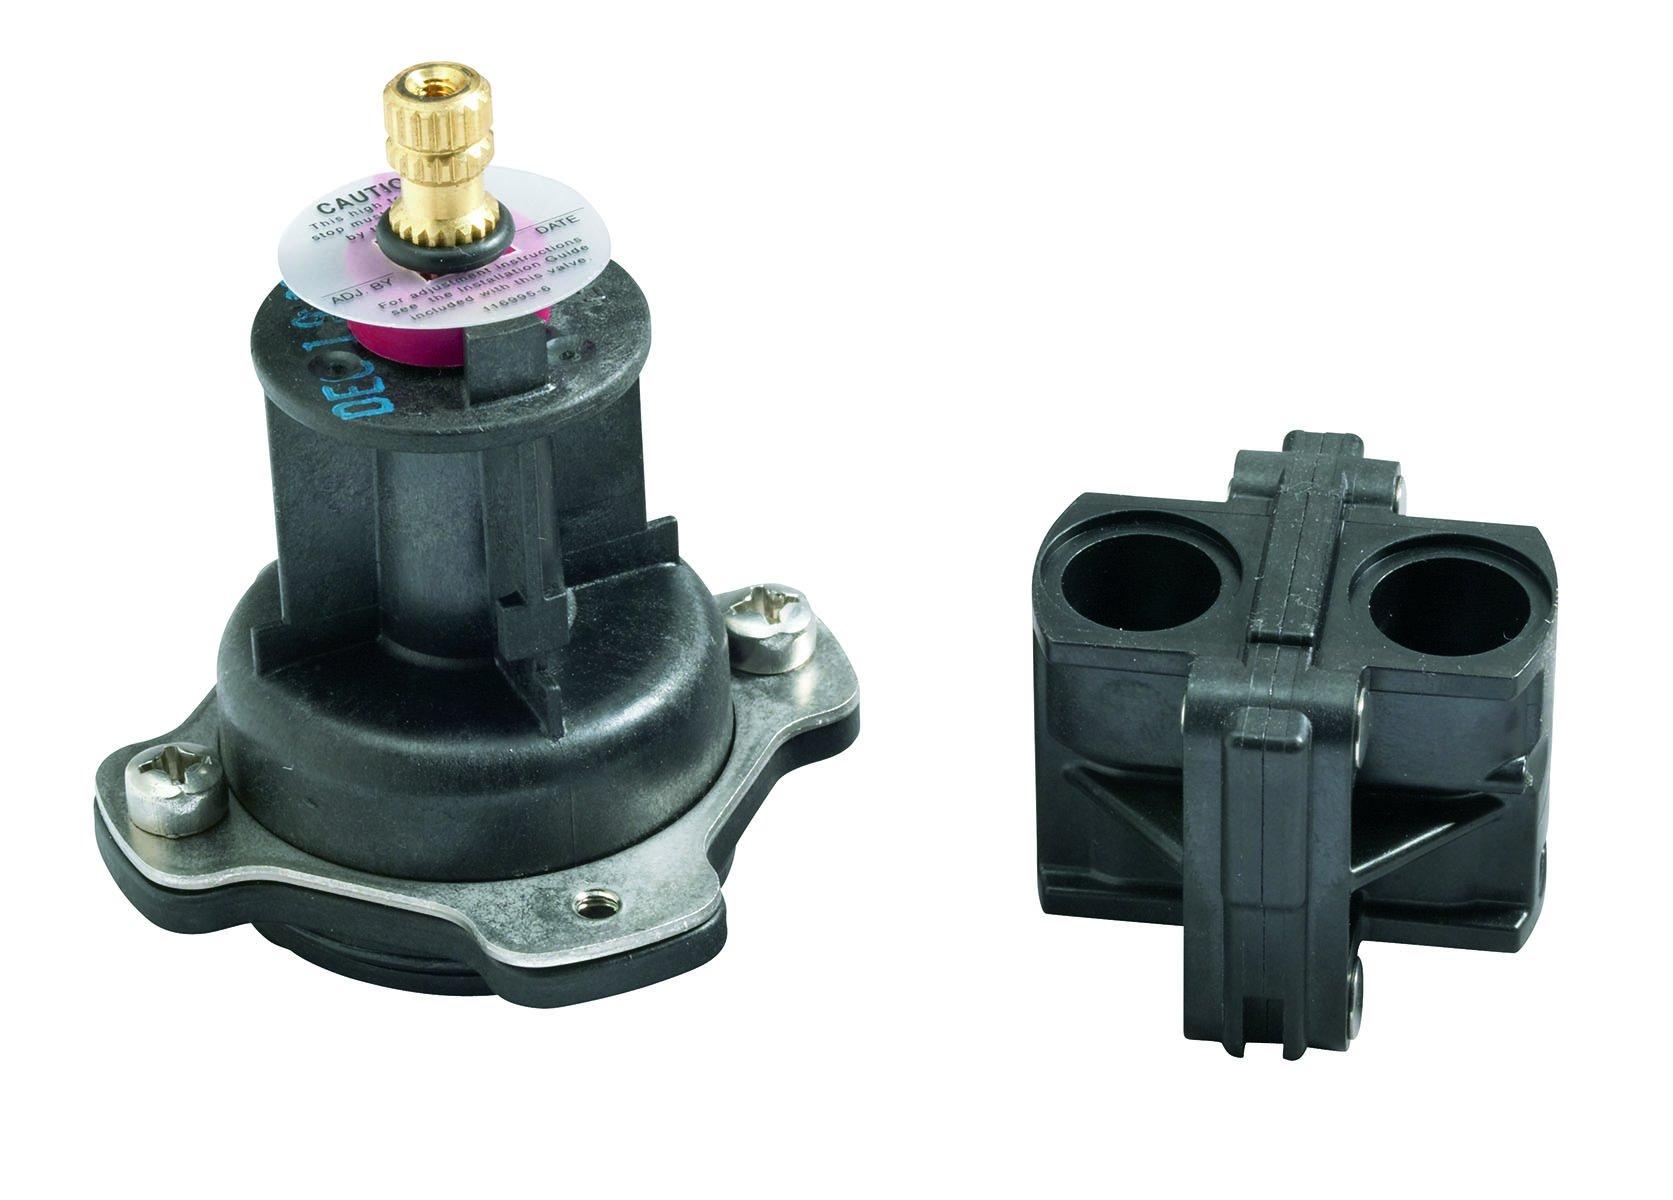 Kohler shower valve replacement parts plywood varnish